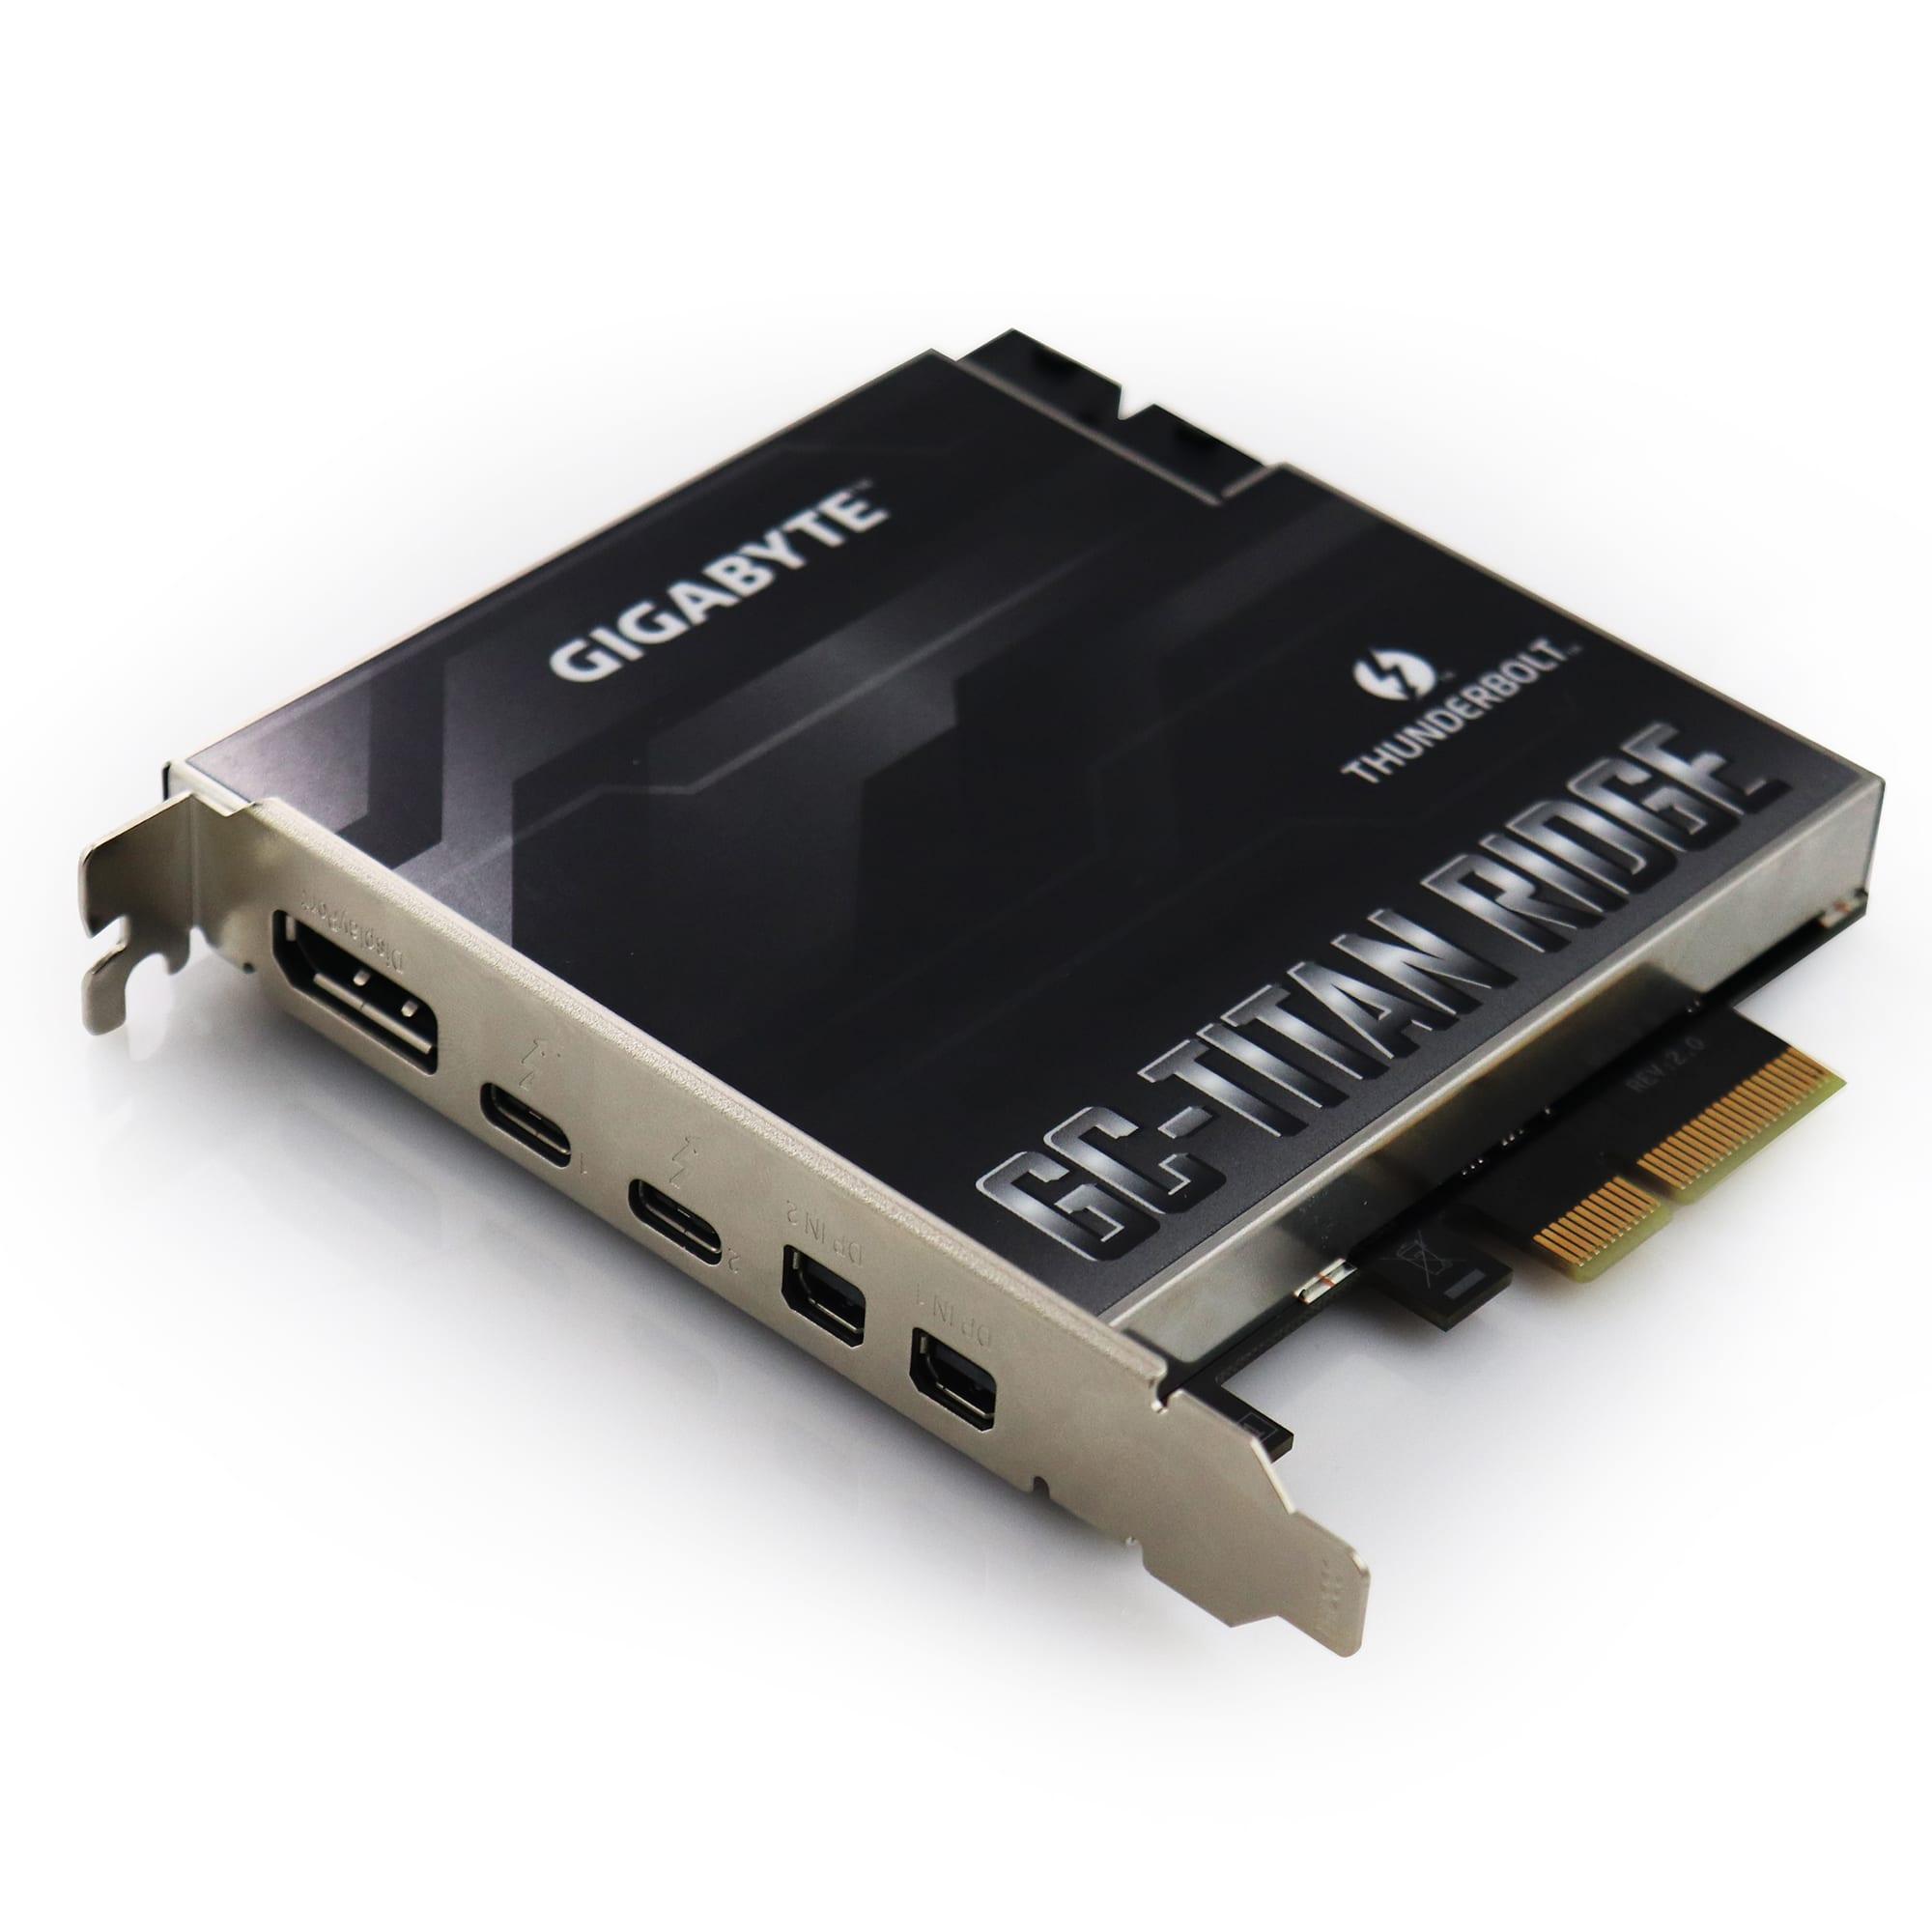 1 x Titan Ridge Thunderbolt 3 PCI-e Card for Mac